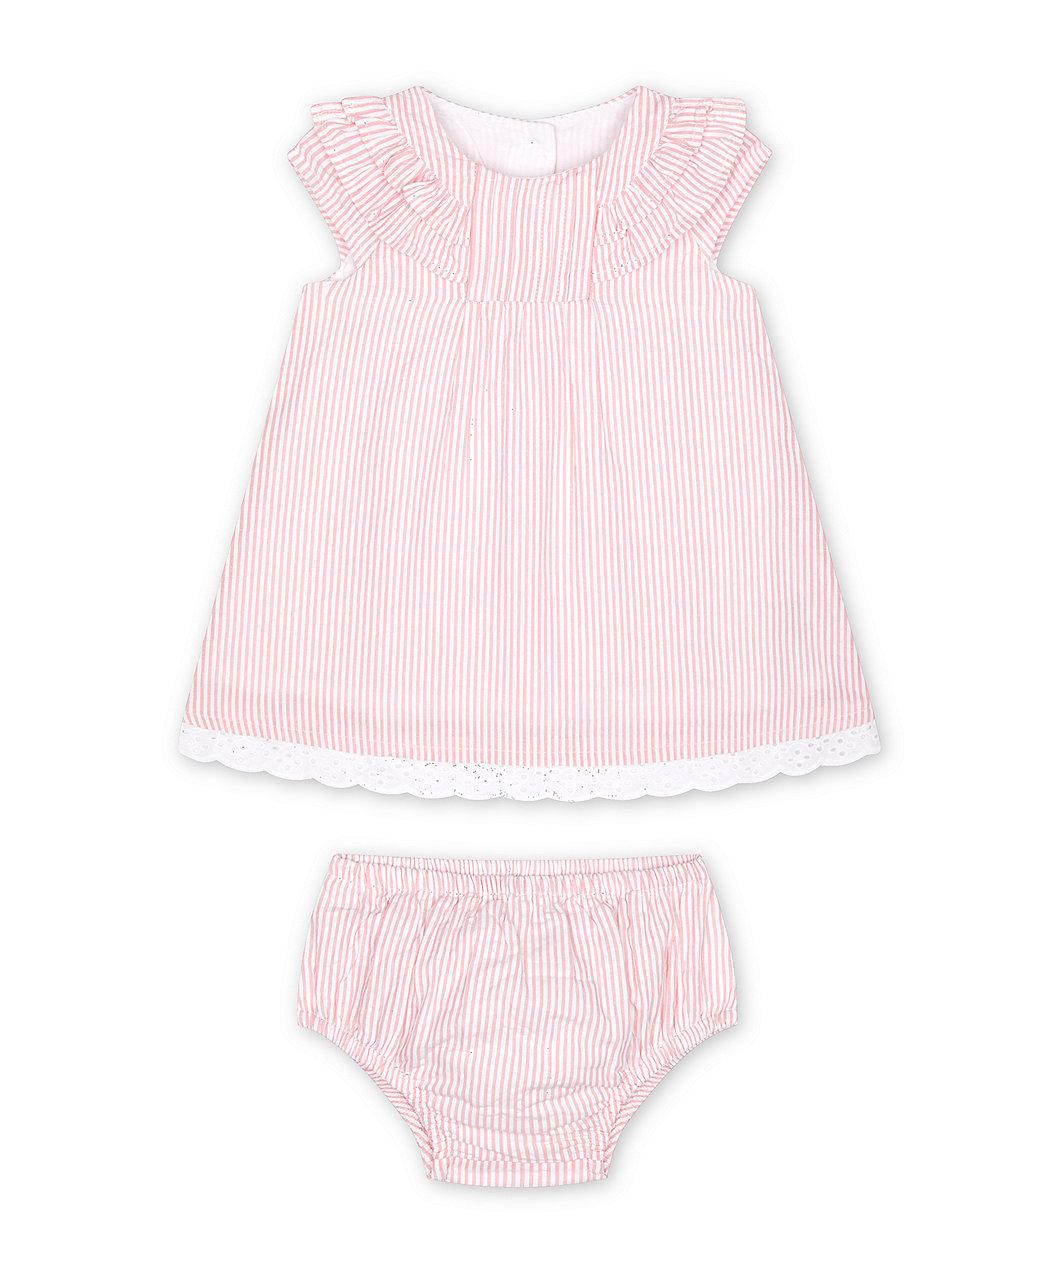 Leggings para Beb/és Mothercare My First